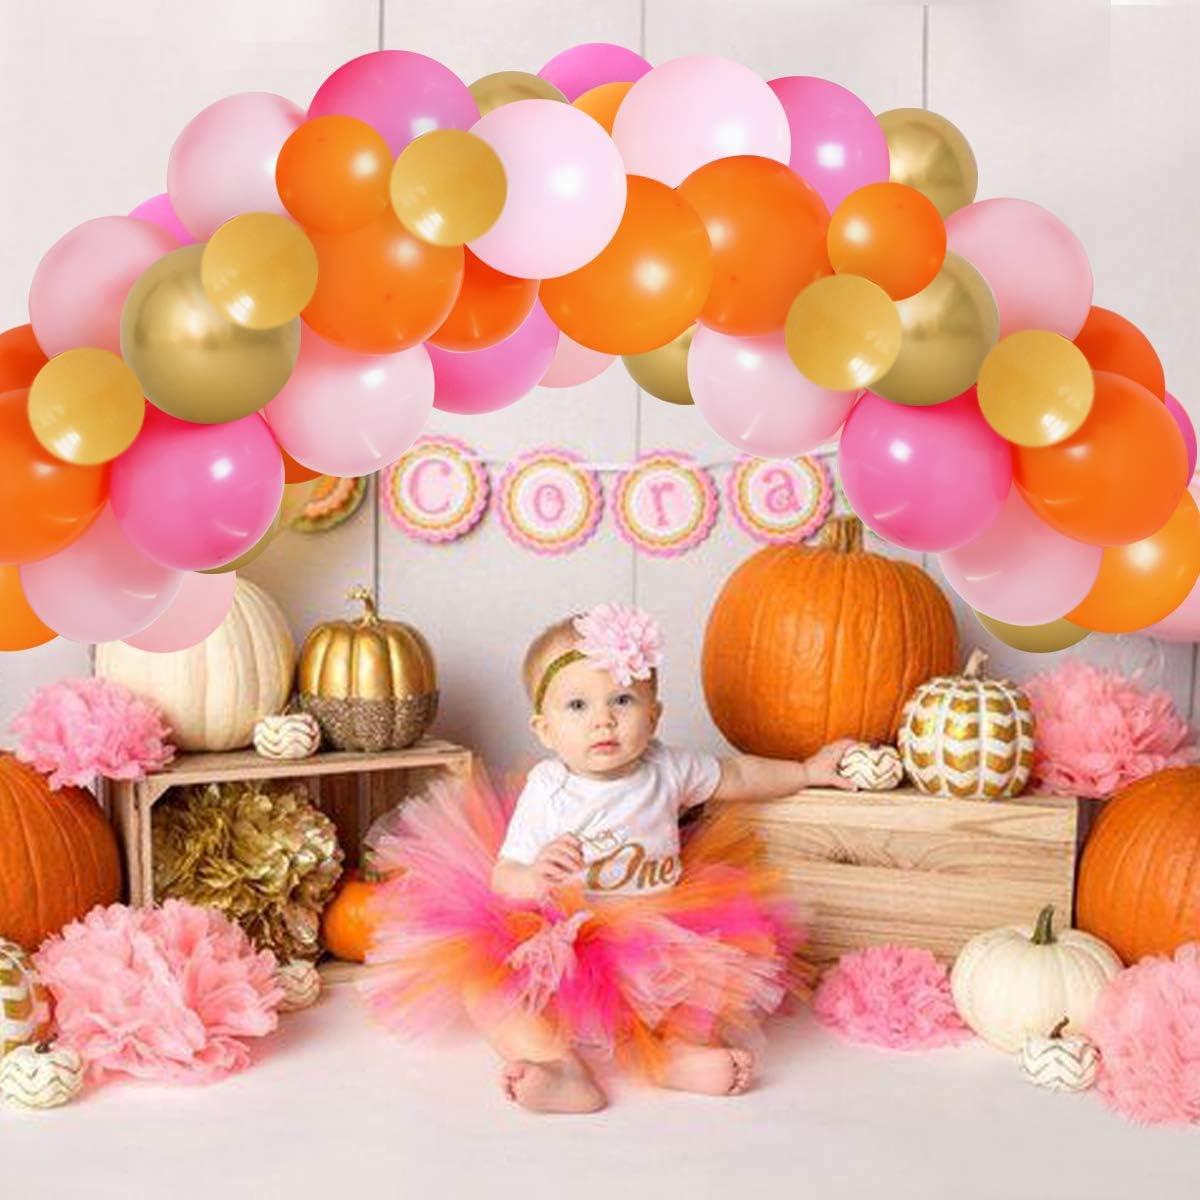 Pumpkin Balloon Garland Kit for Girls Fall Little Pumpkin Theme Baby Shower Birthday Orange Yellow Pink Decorations 80 pack